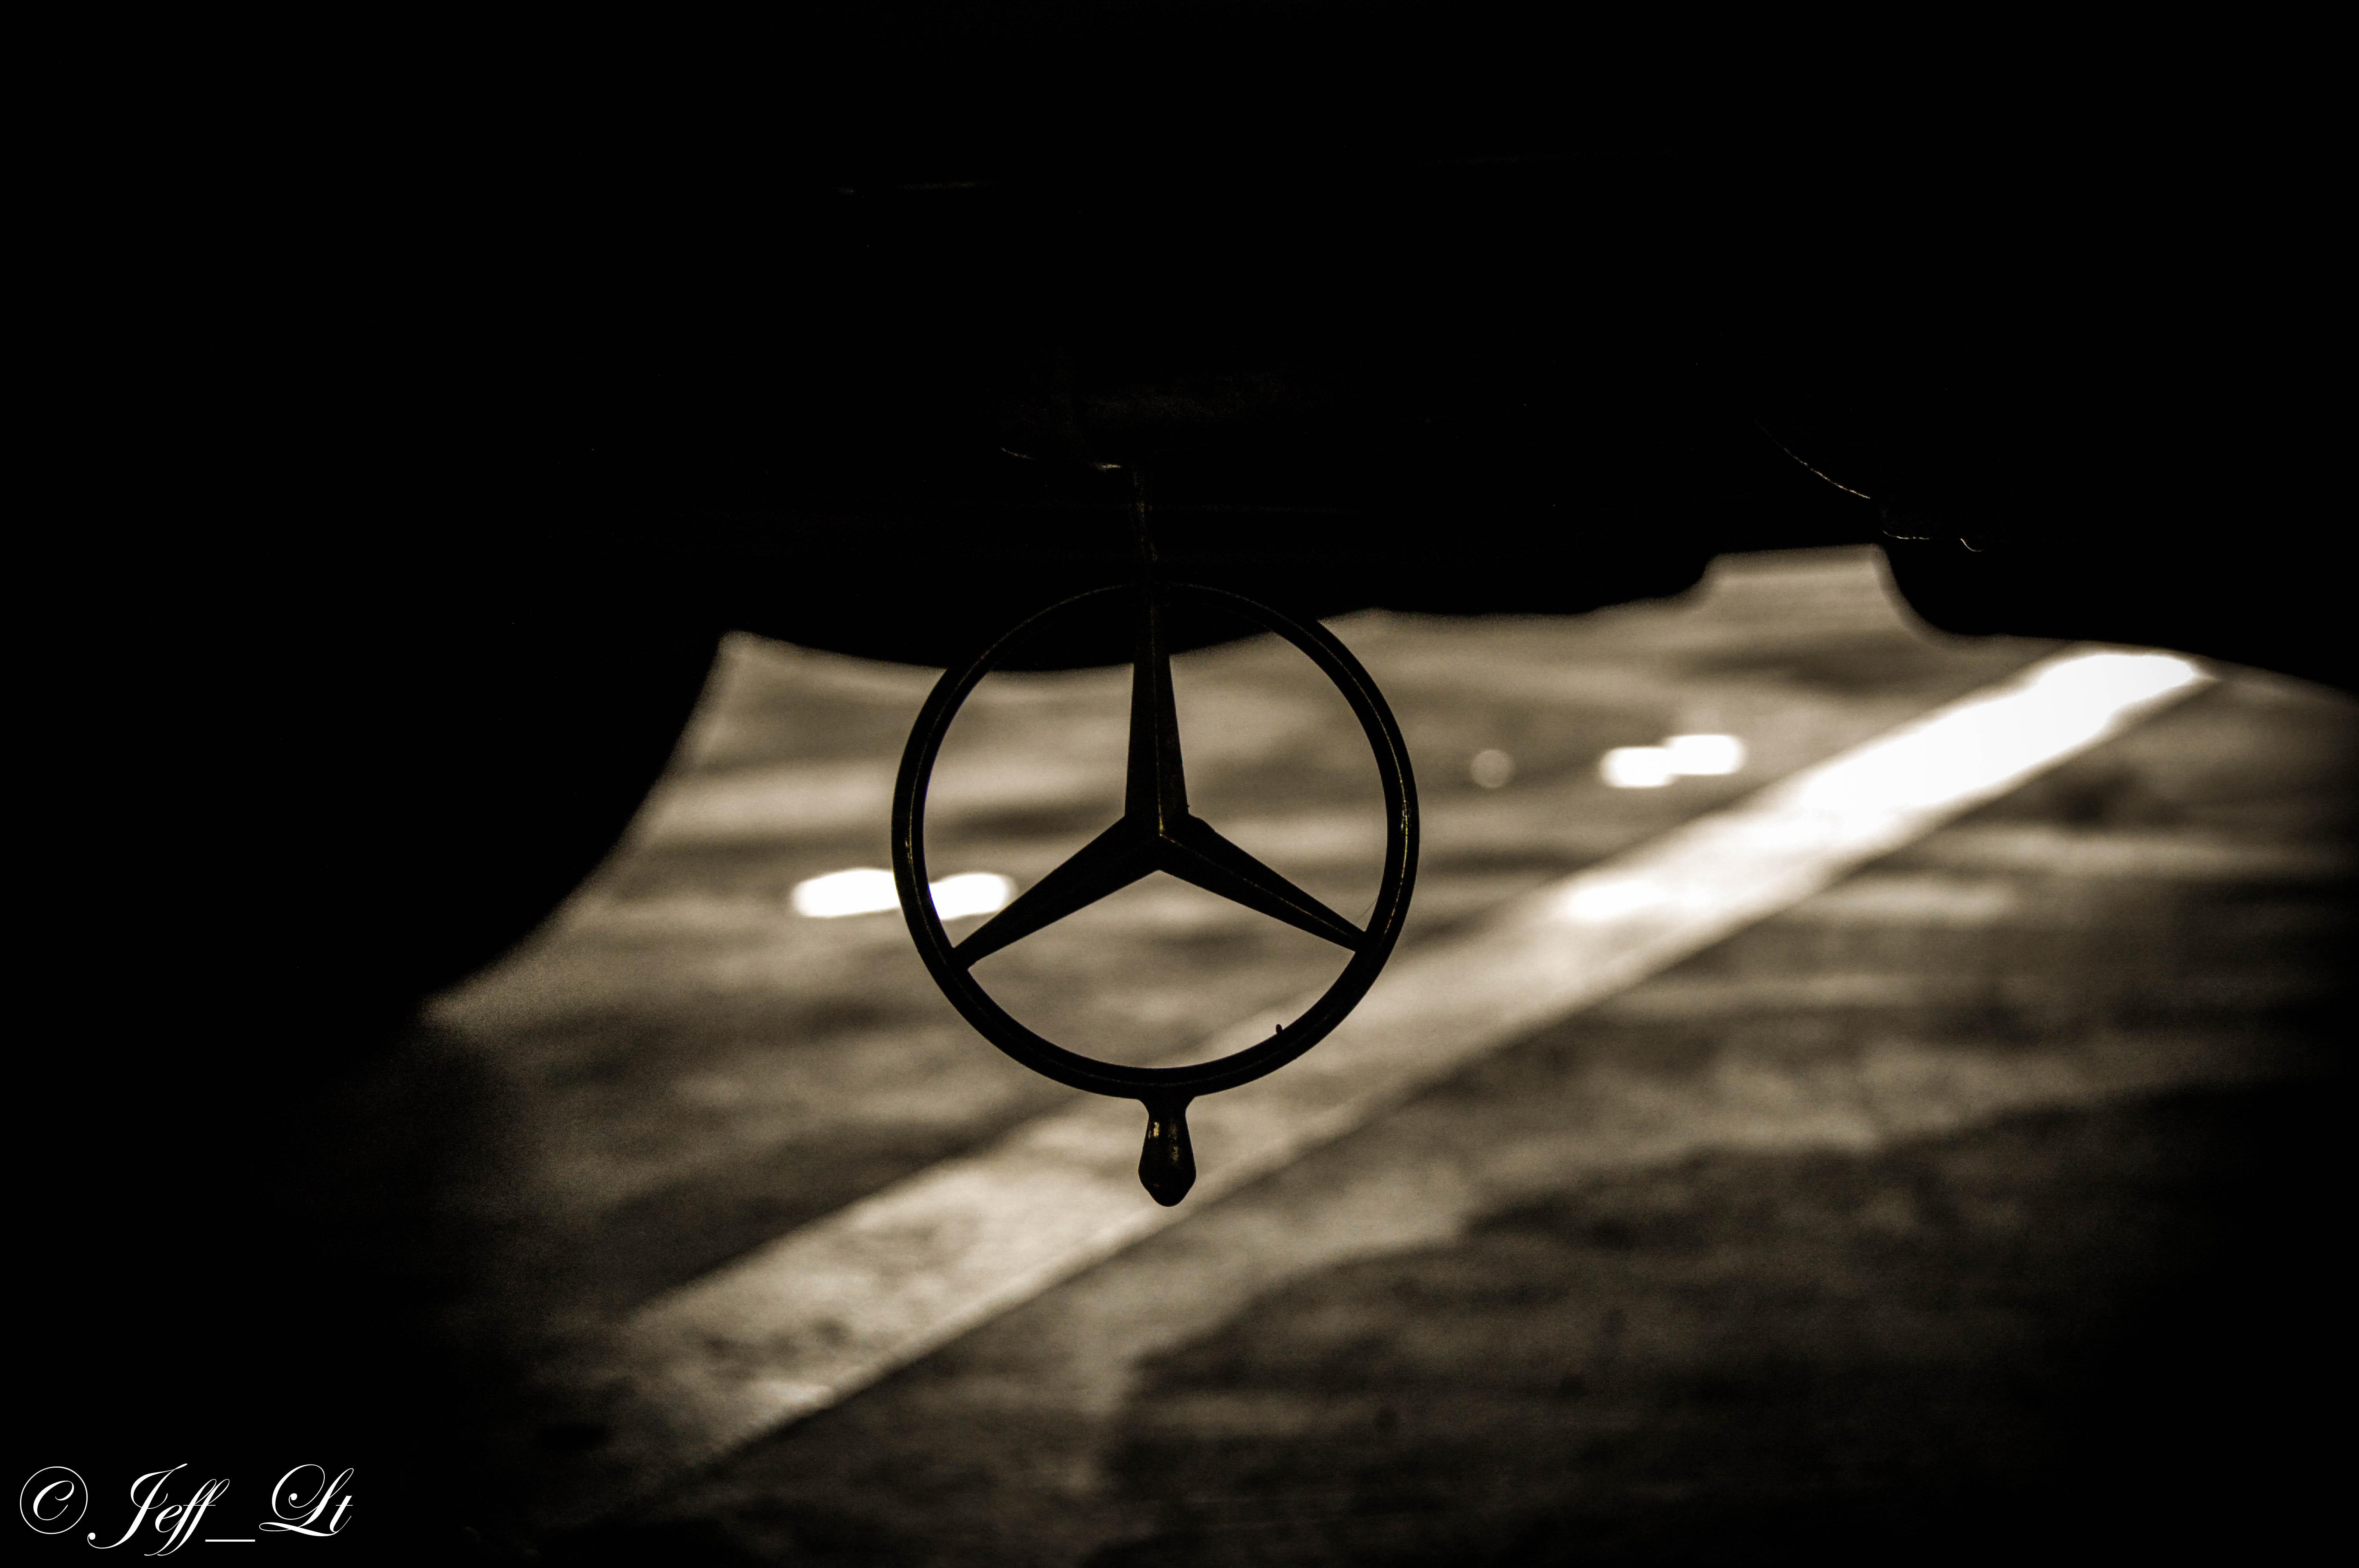 Photo Mercedes-Benz de Dady Jeff 6